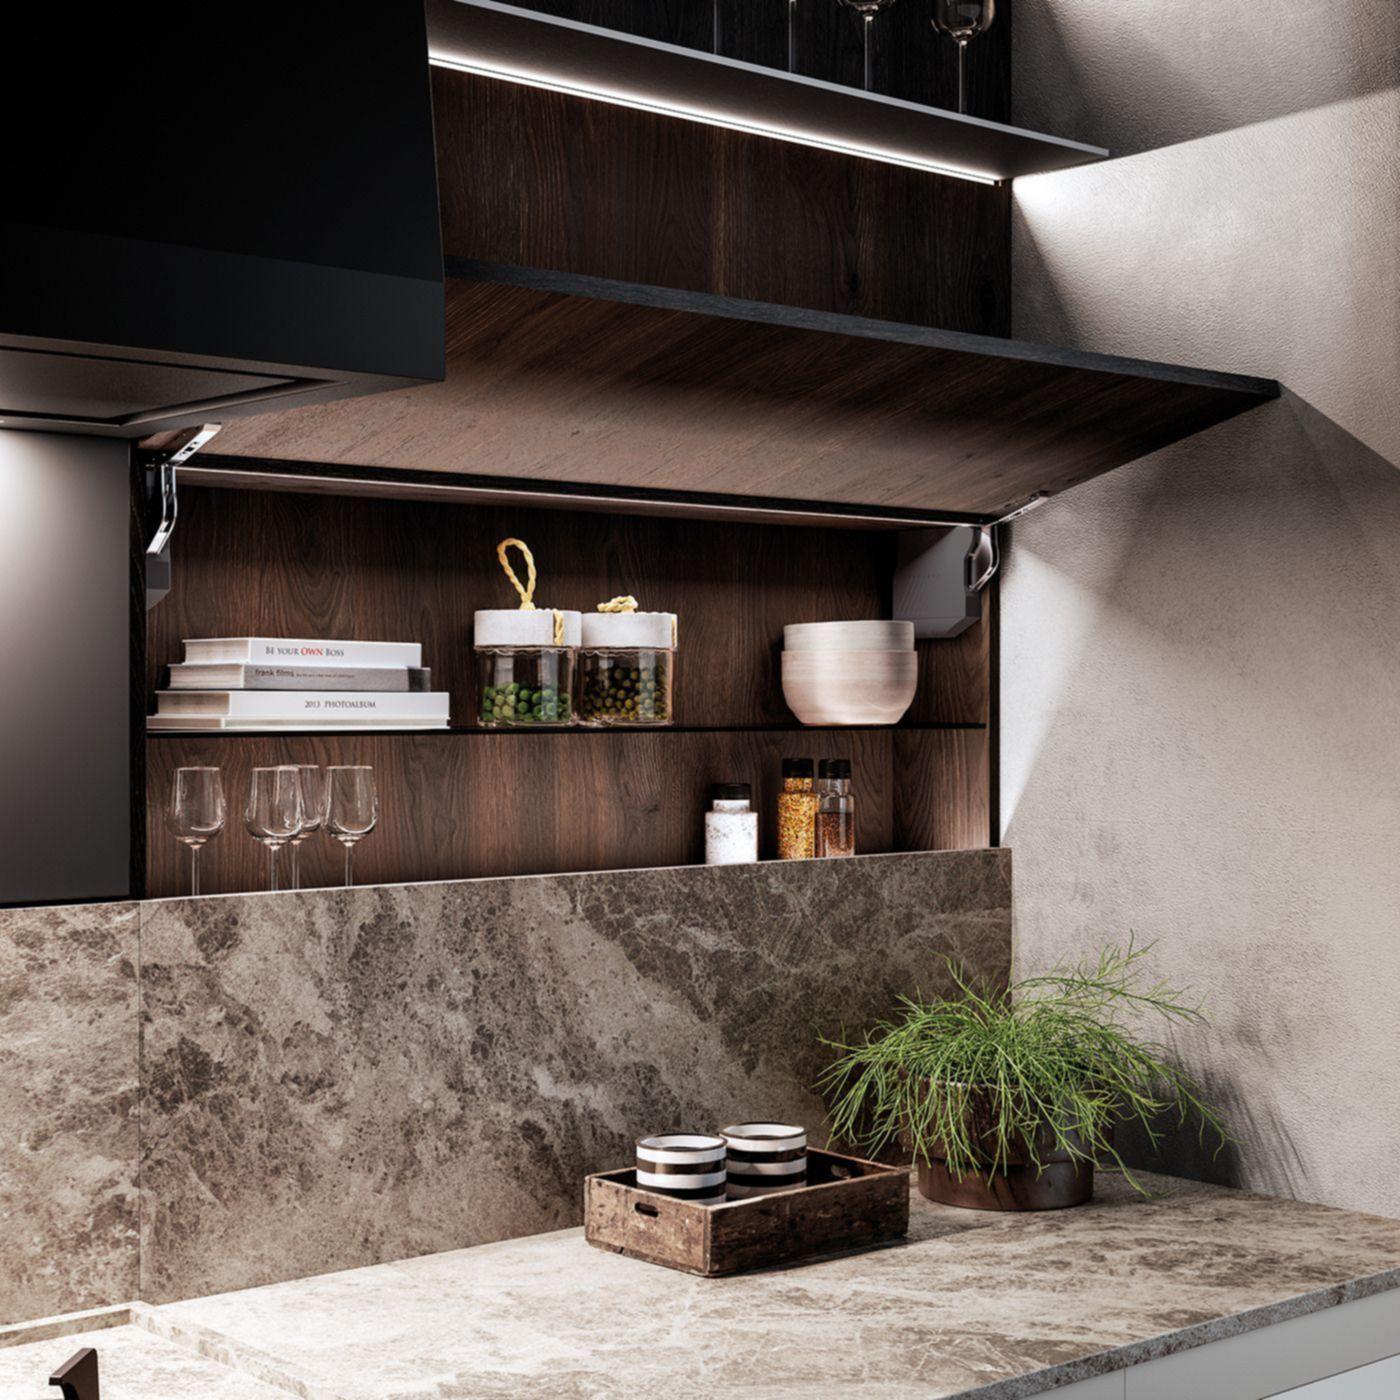 Dry And Wet Kitchen Design Photos: Best And Wonderful 13 Wet Dry Kitchen Ideas